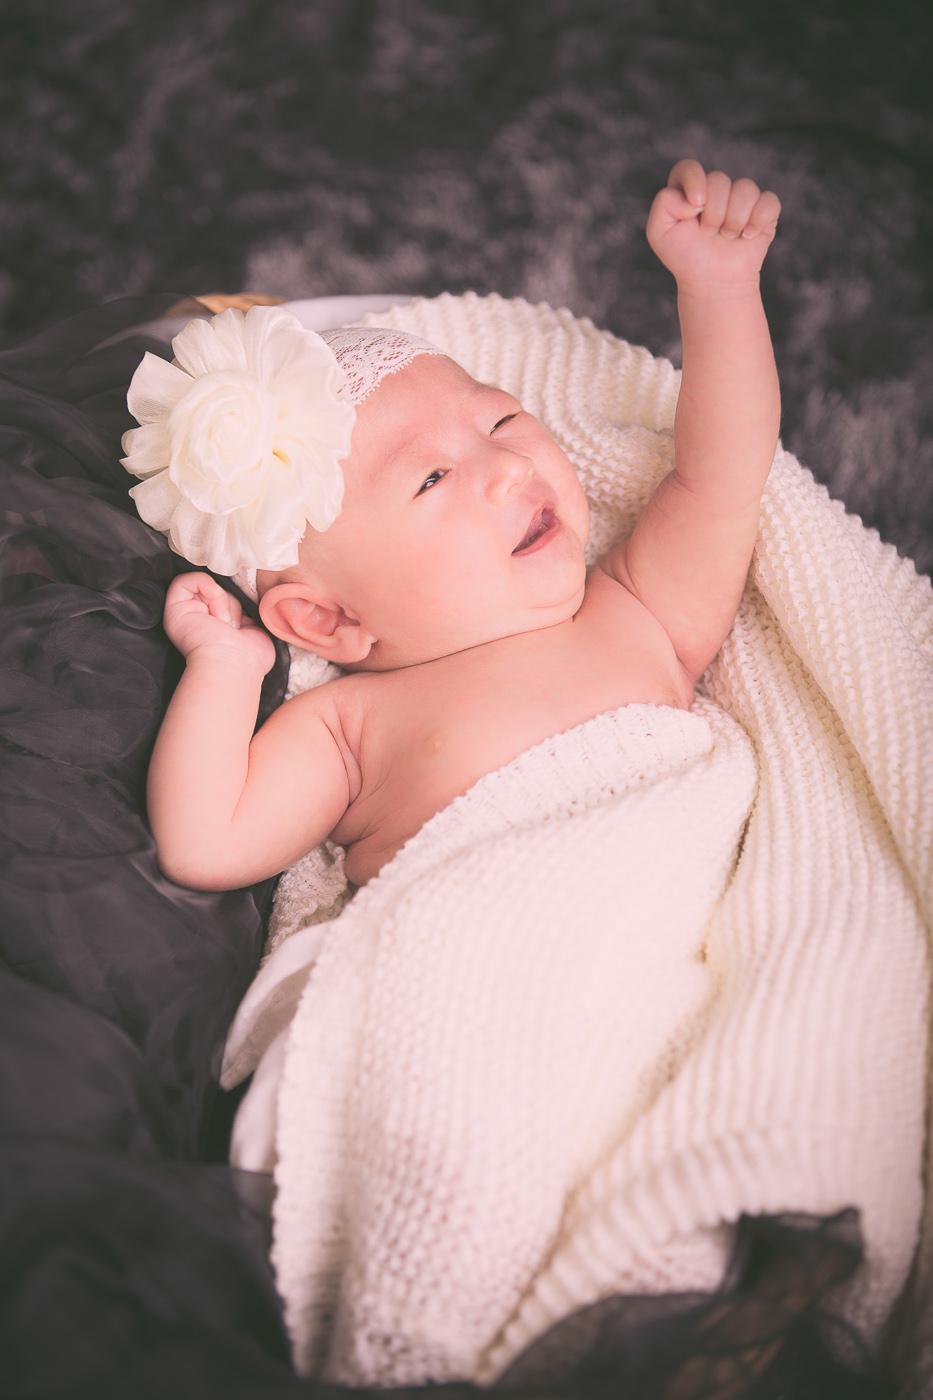 penang-baby-photographer.jpg